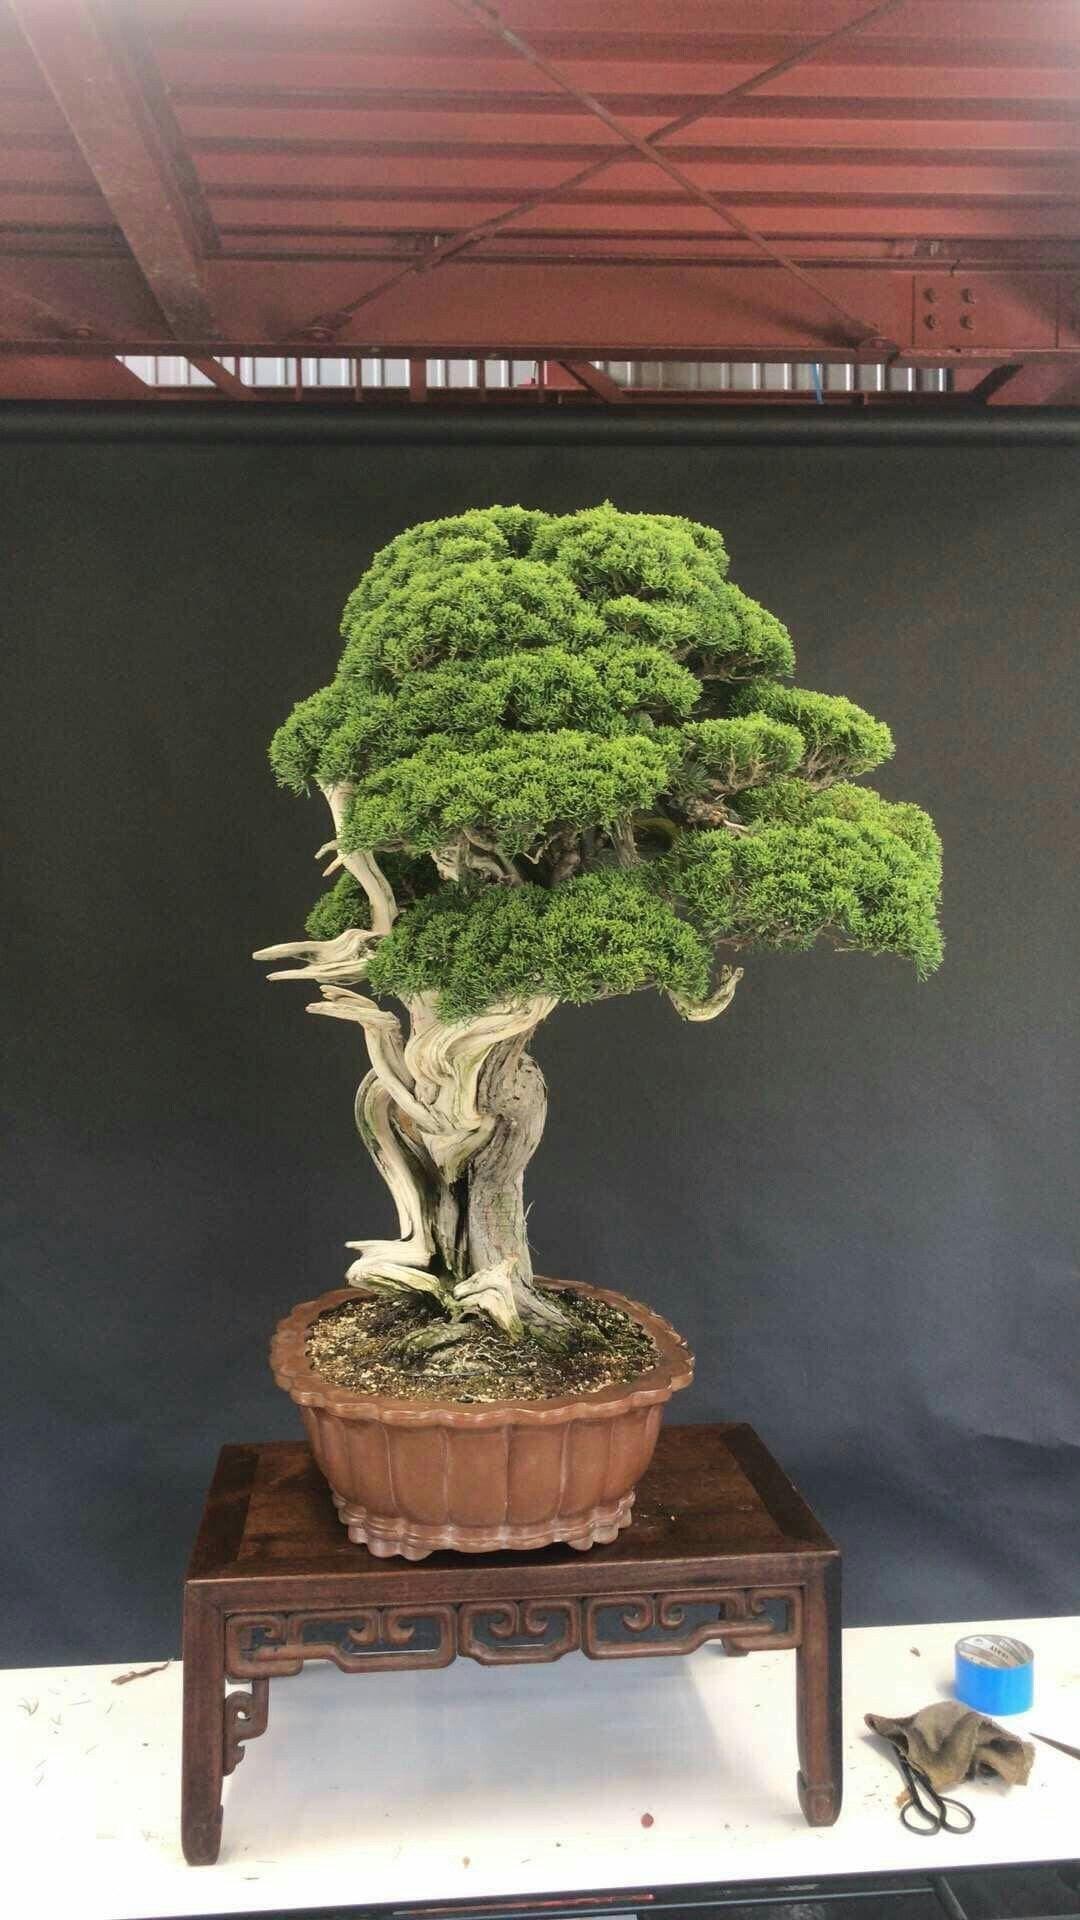 33 Beautiful Acer Bonsai Tree Pictures Bonsai Gallery Bonsai Bonsai Tree Acer Bonsai